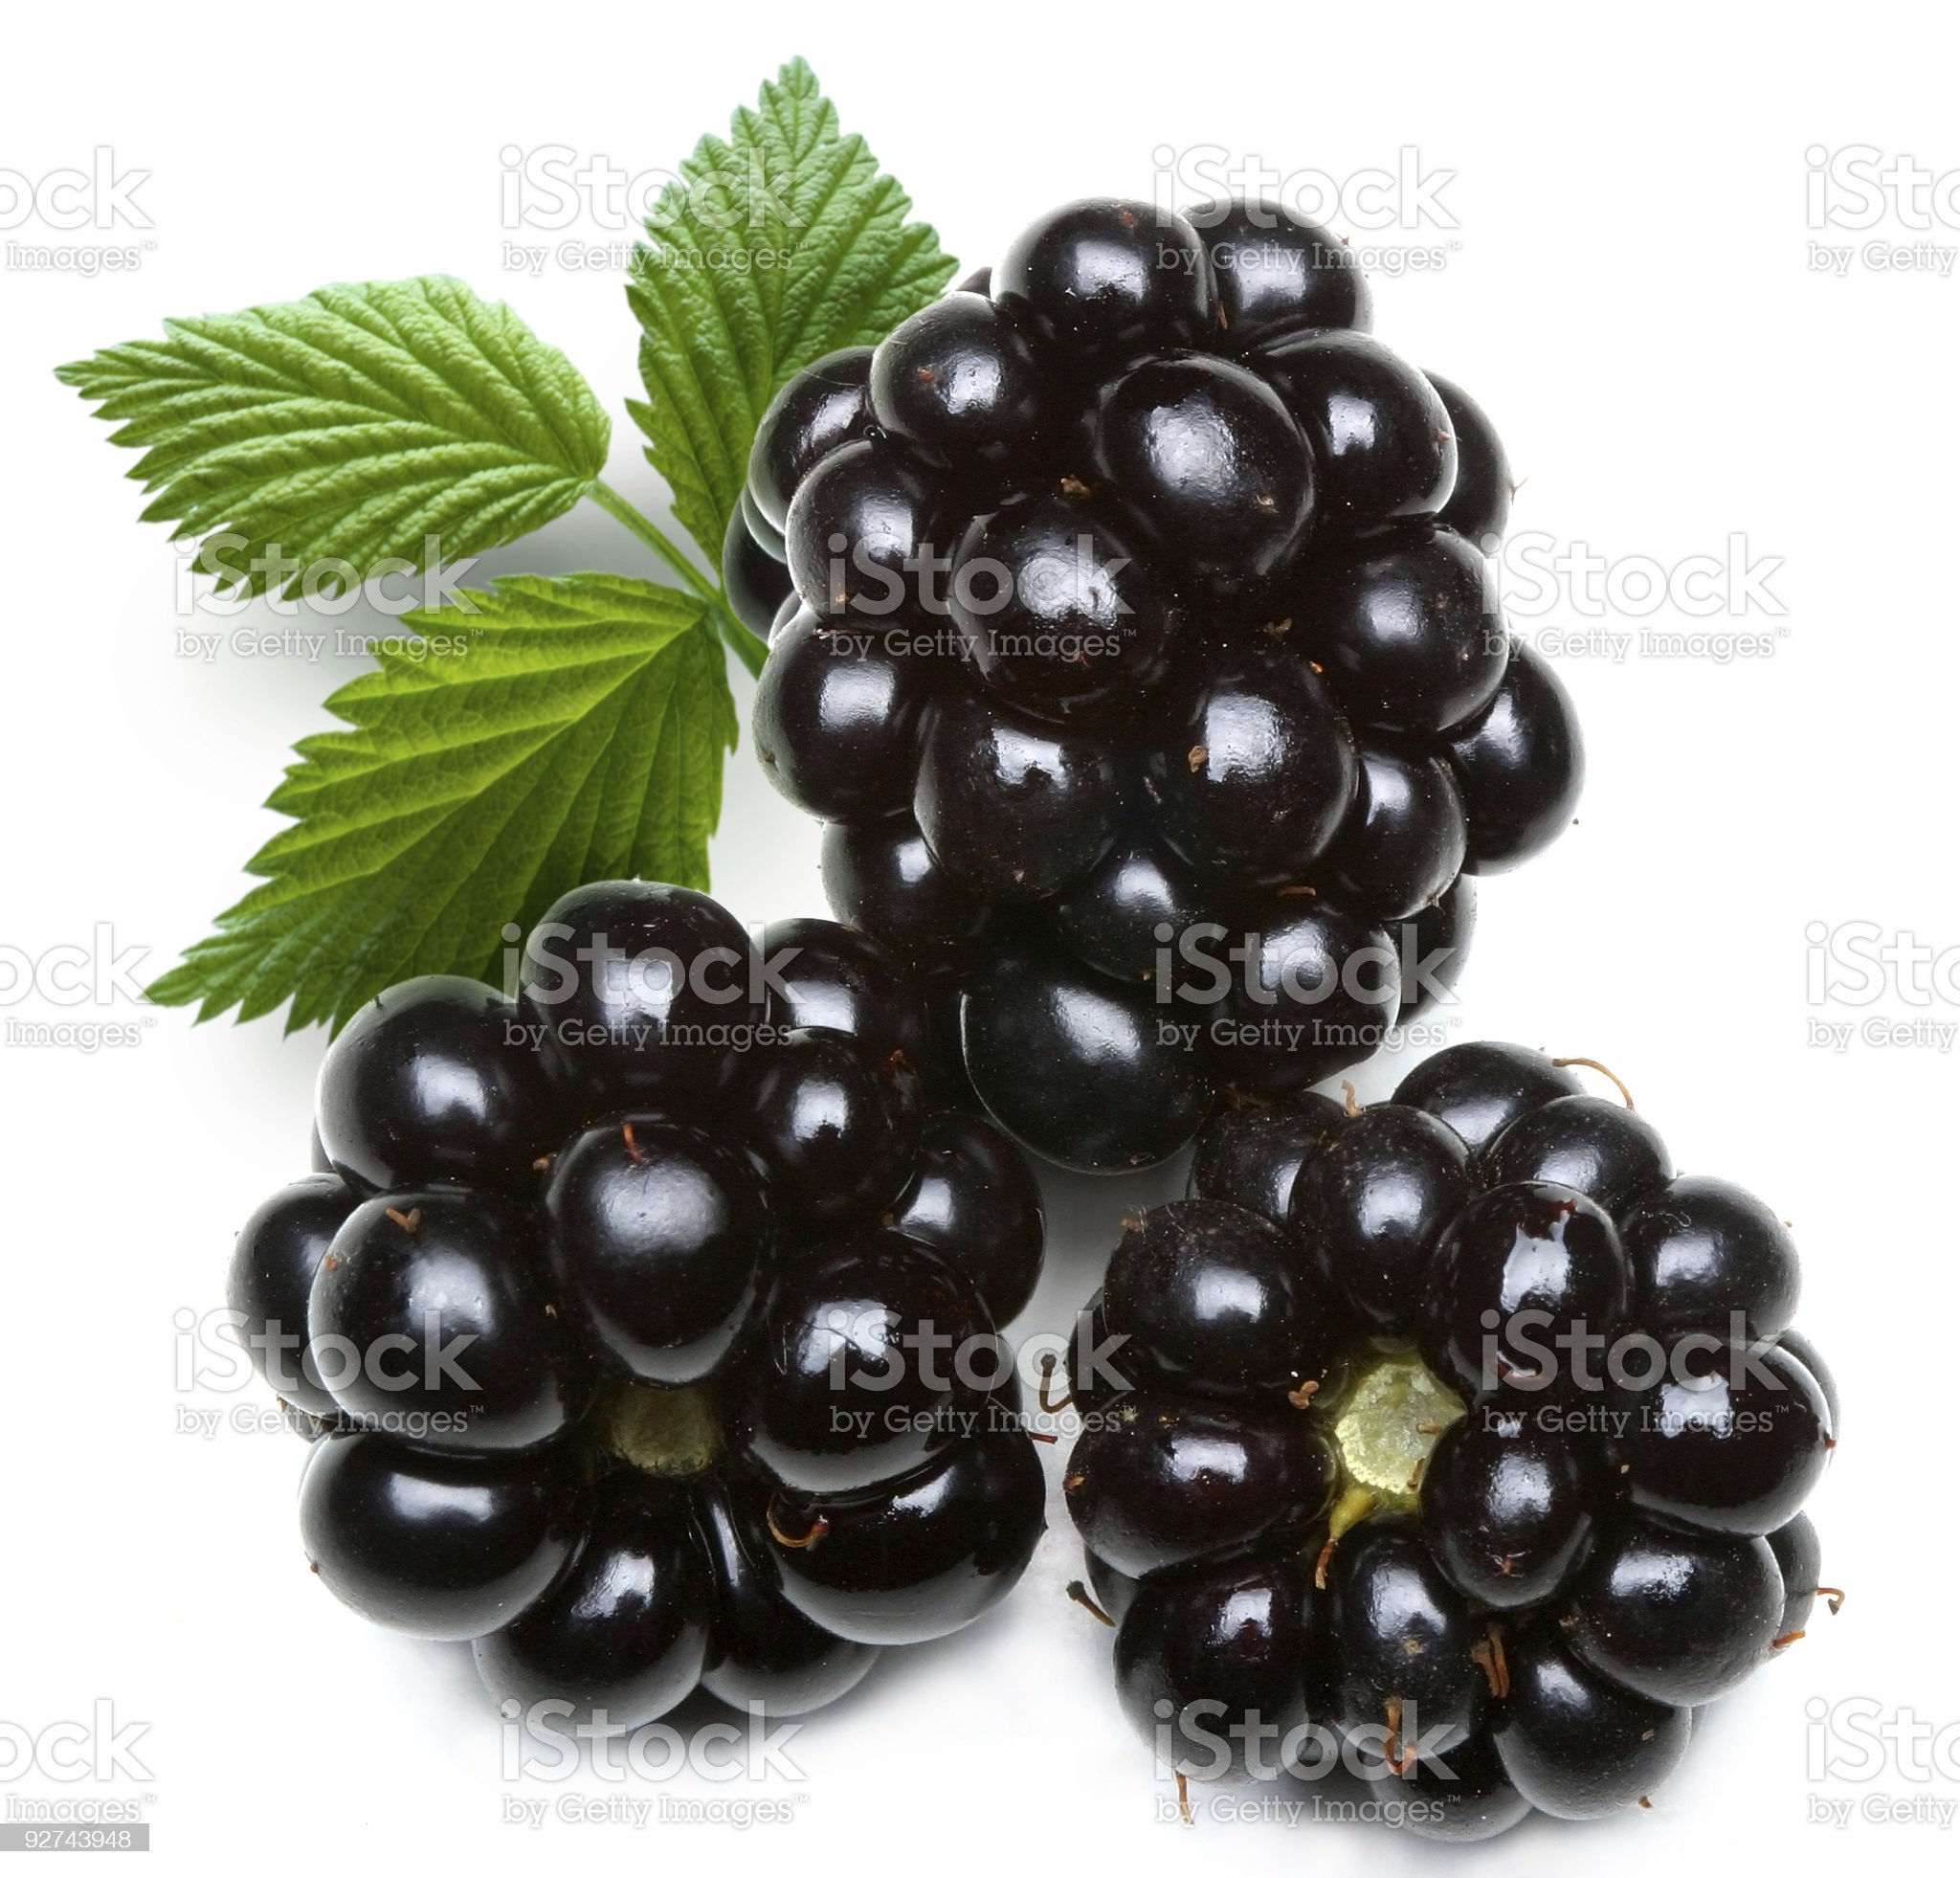 Closeup of three blackberries on white background royalty-free stock photo